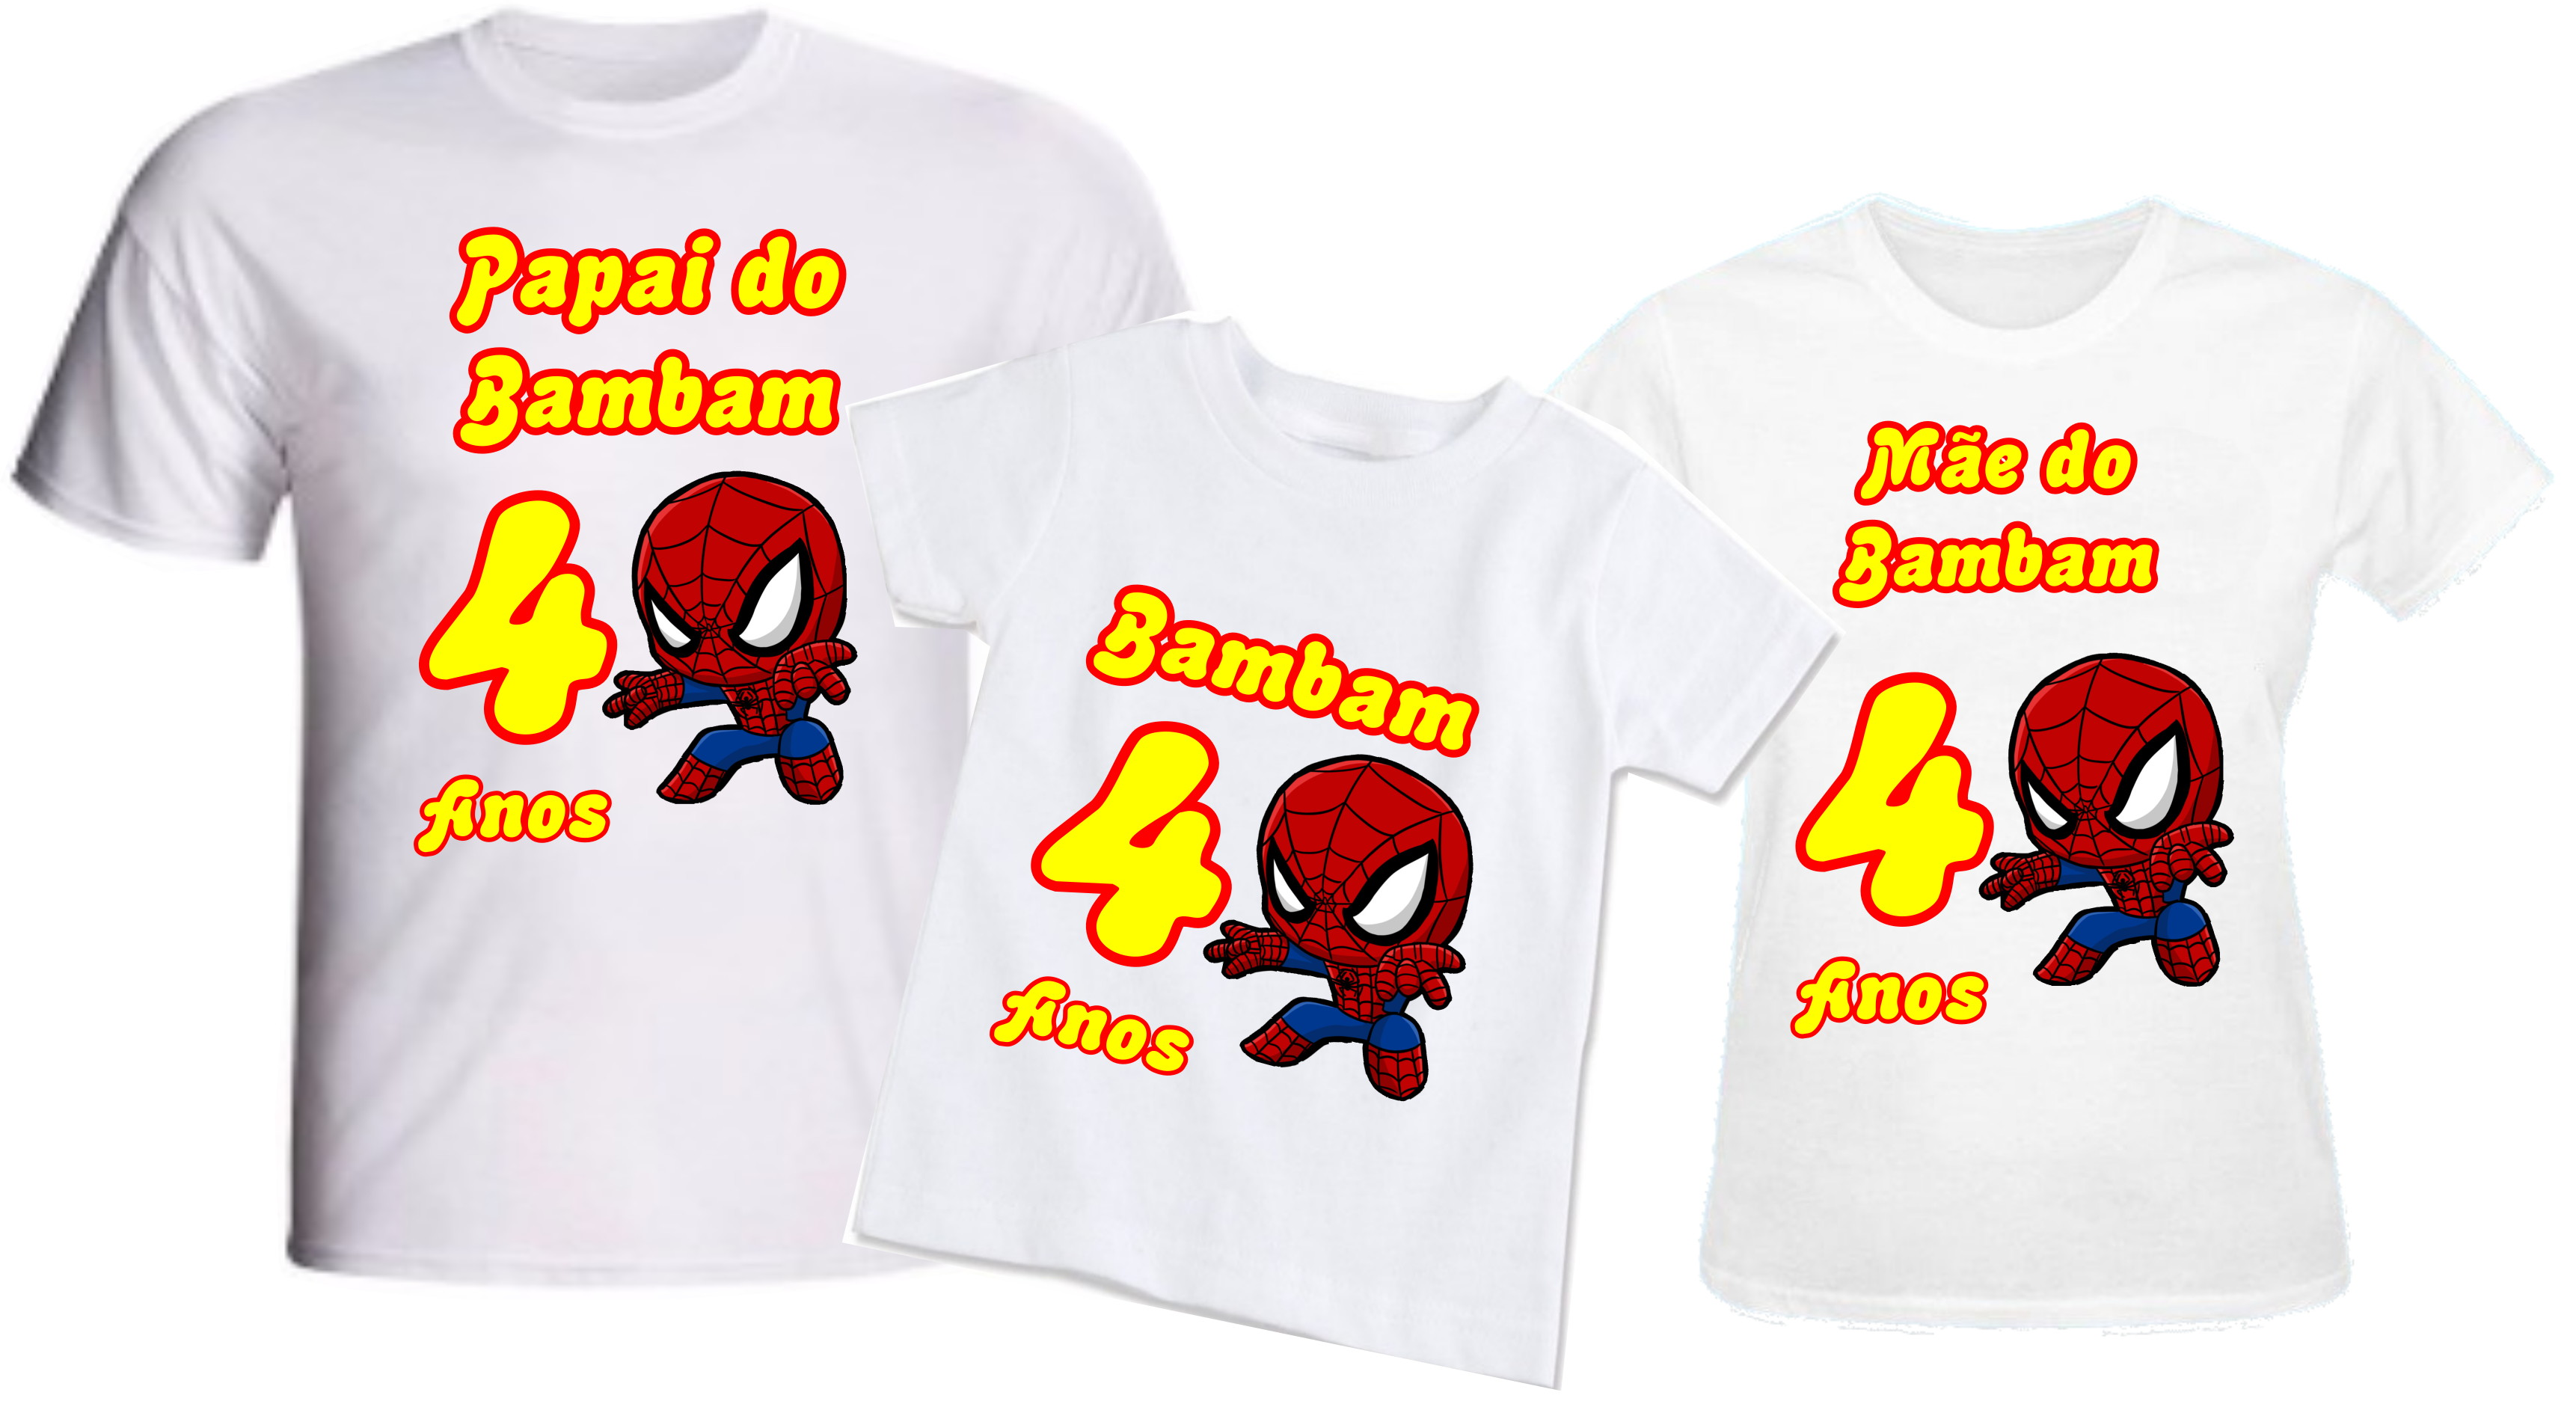 329ccf6139 Camiseta Personalizada Aniversario Pai Mae Filho Irmao